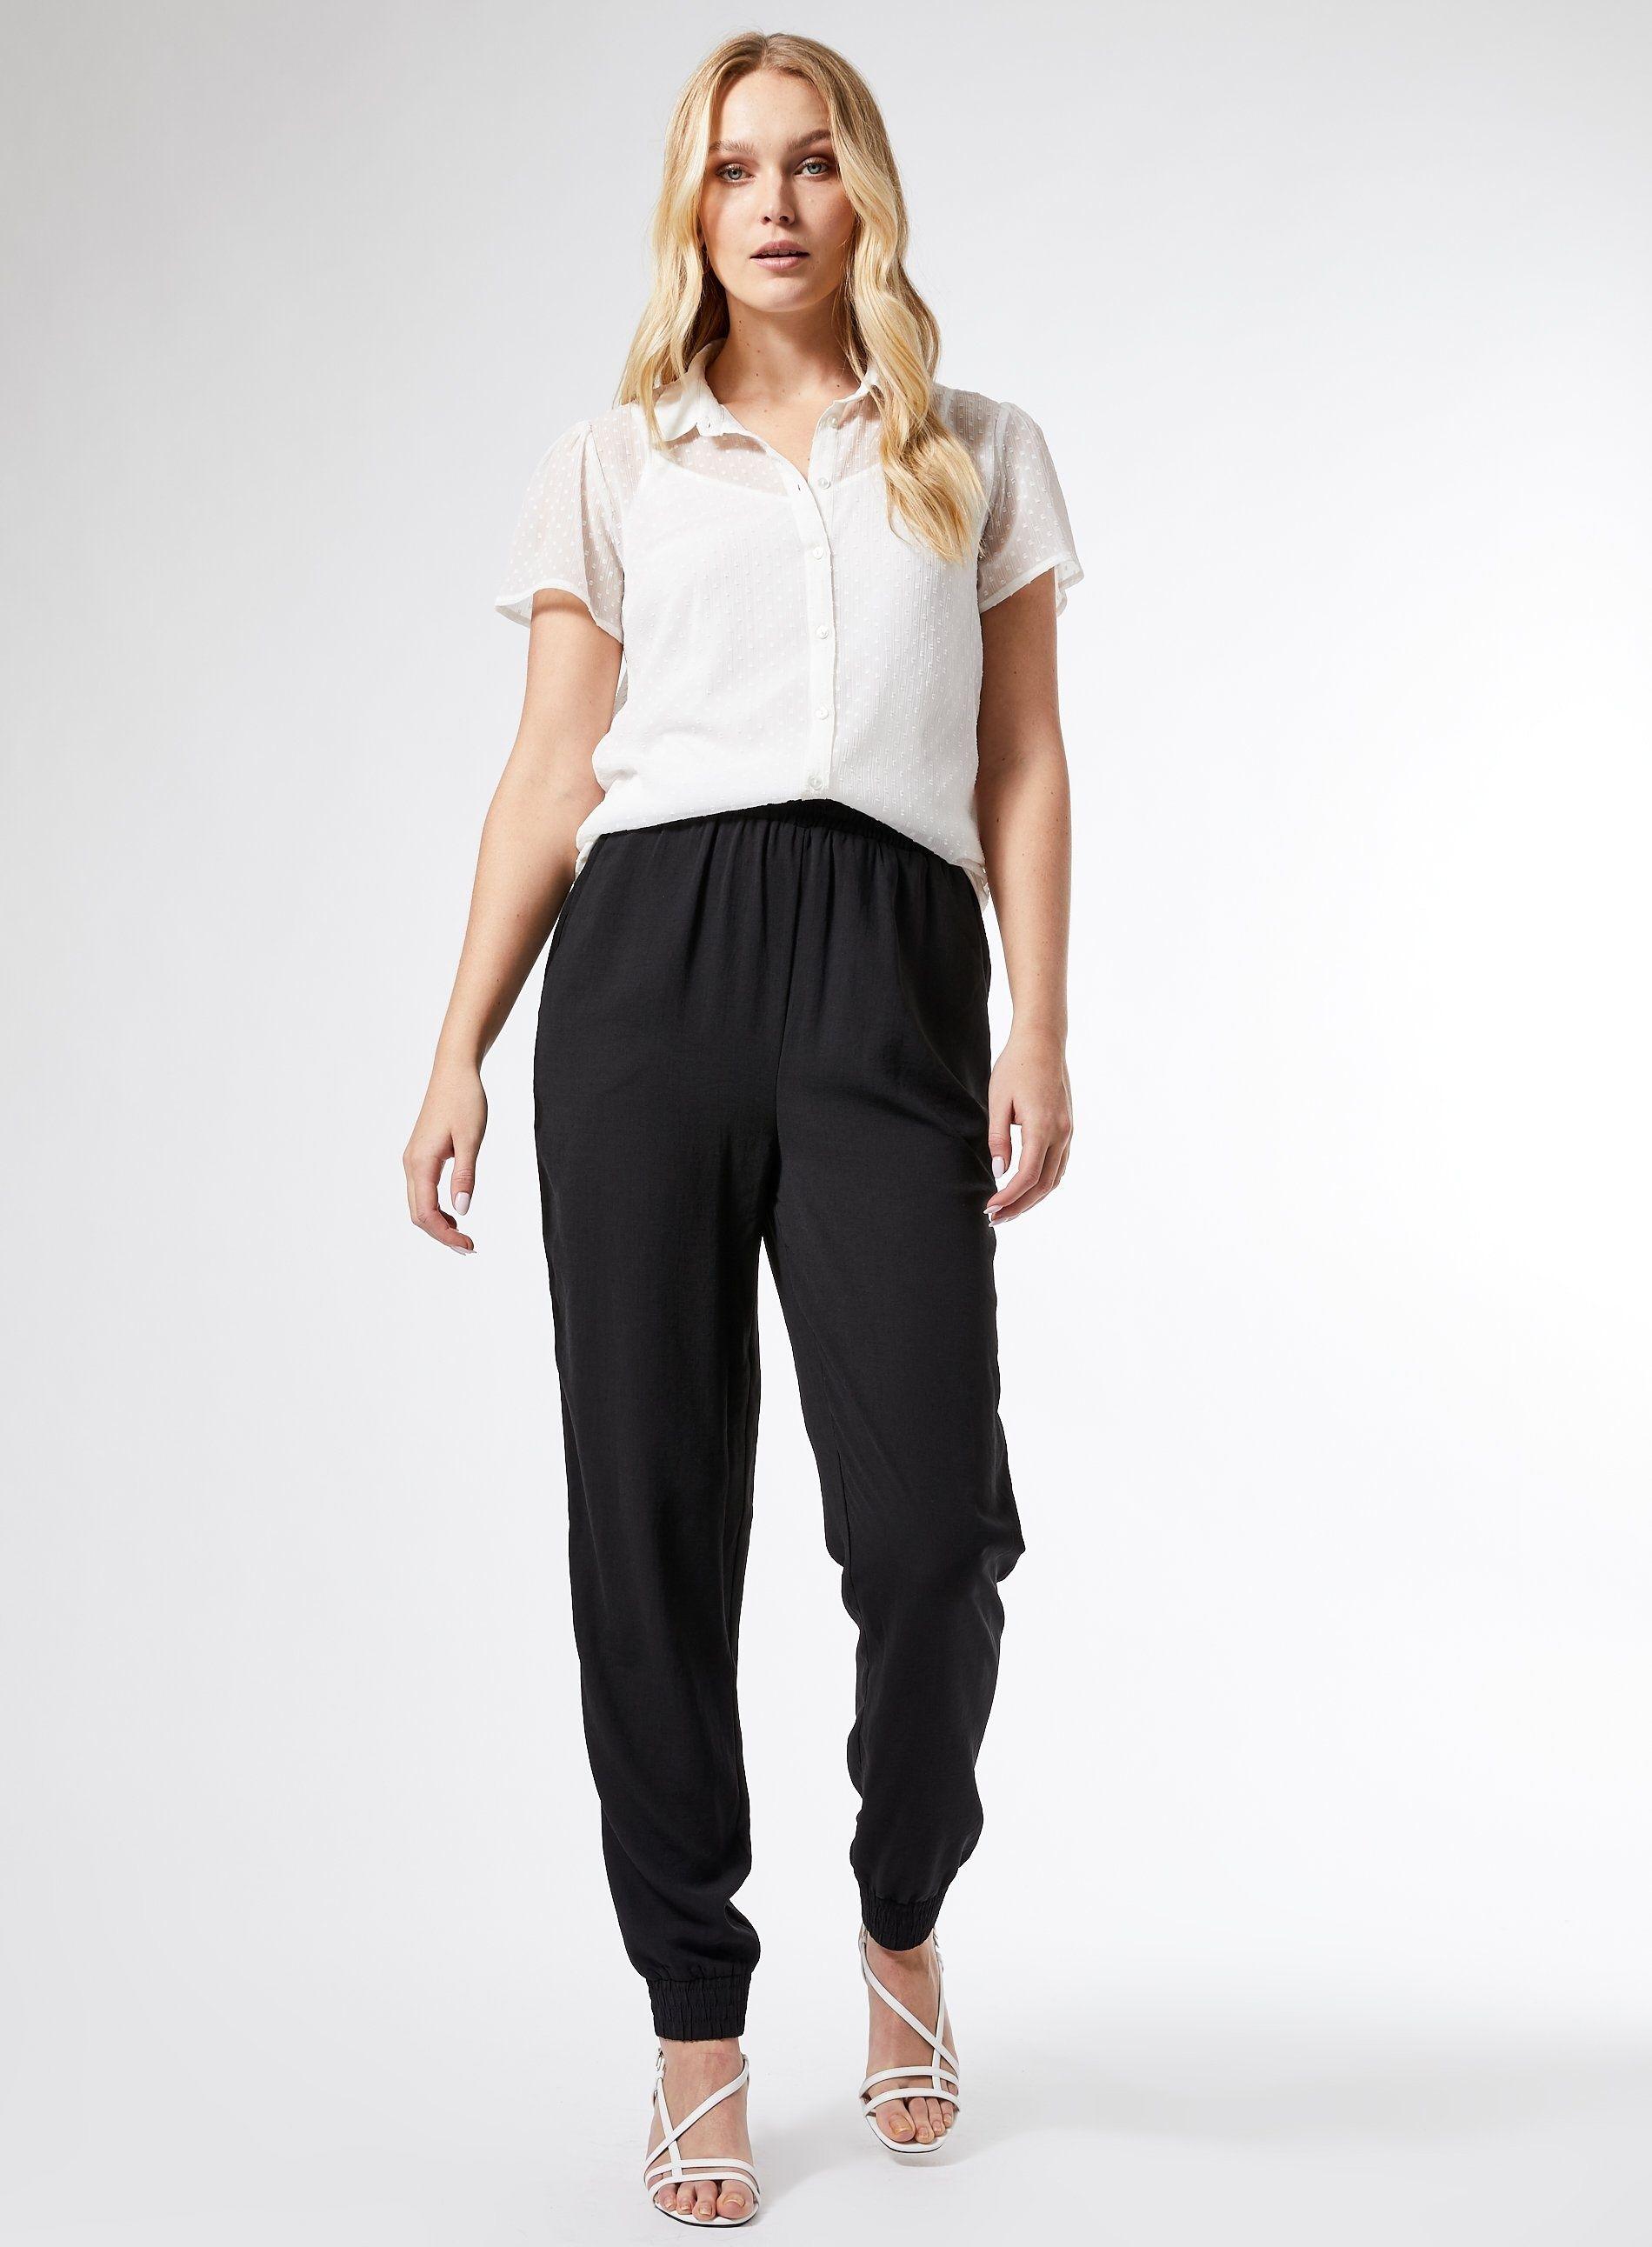 Dorothy Perkins Womens Tall Ivory Dobby Blouse Short Sleeve V-Neck Blouse